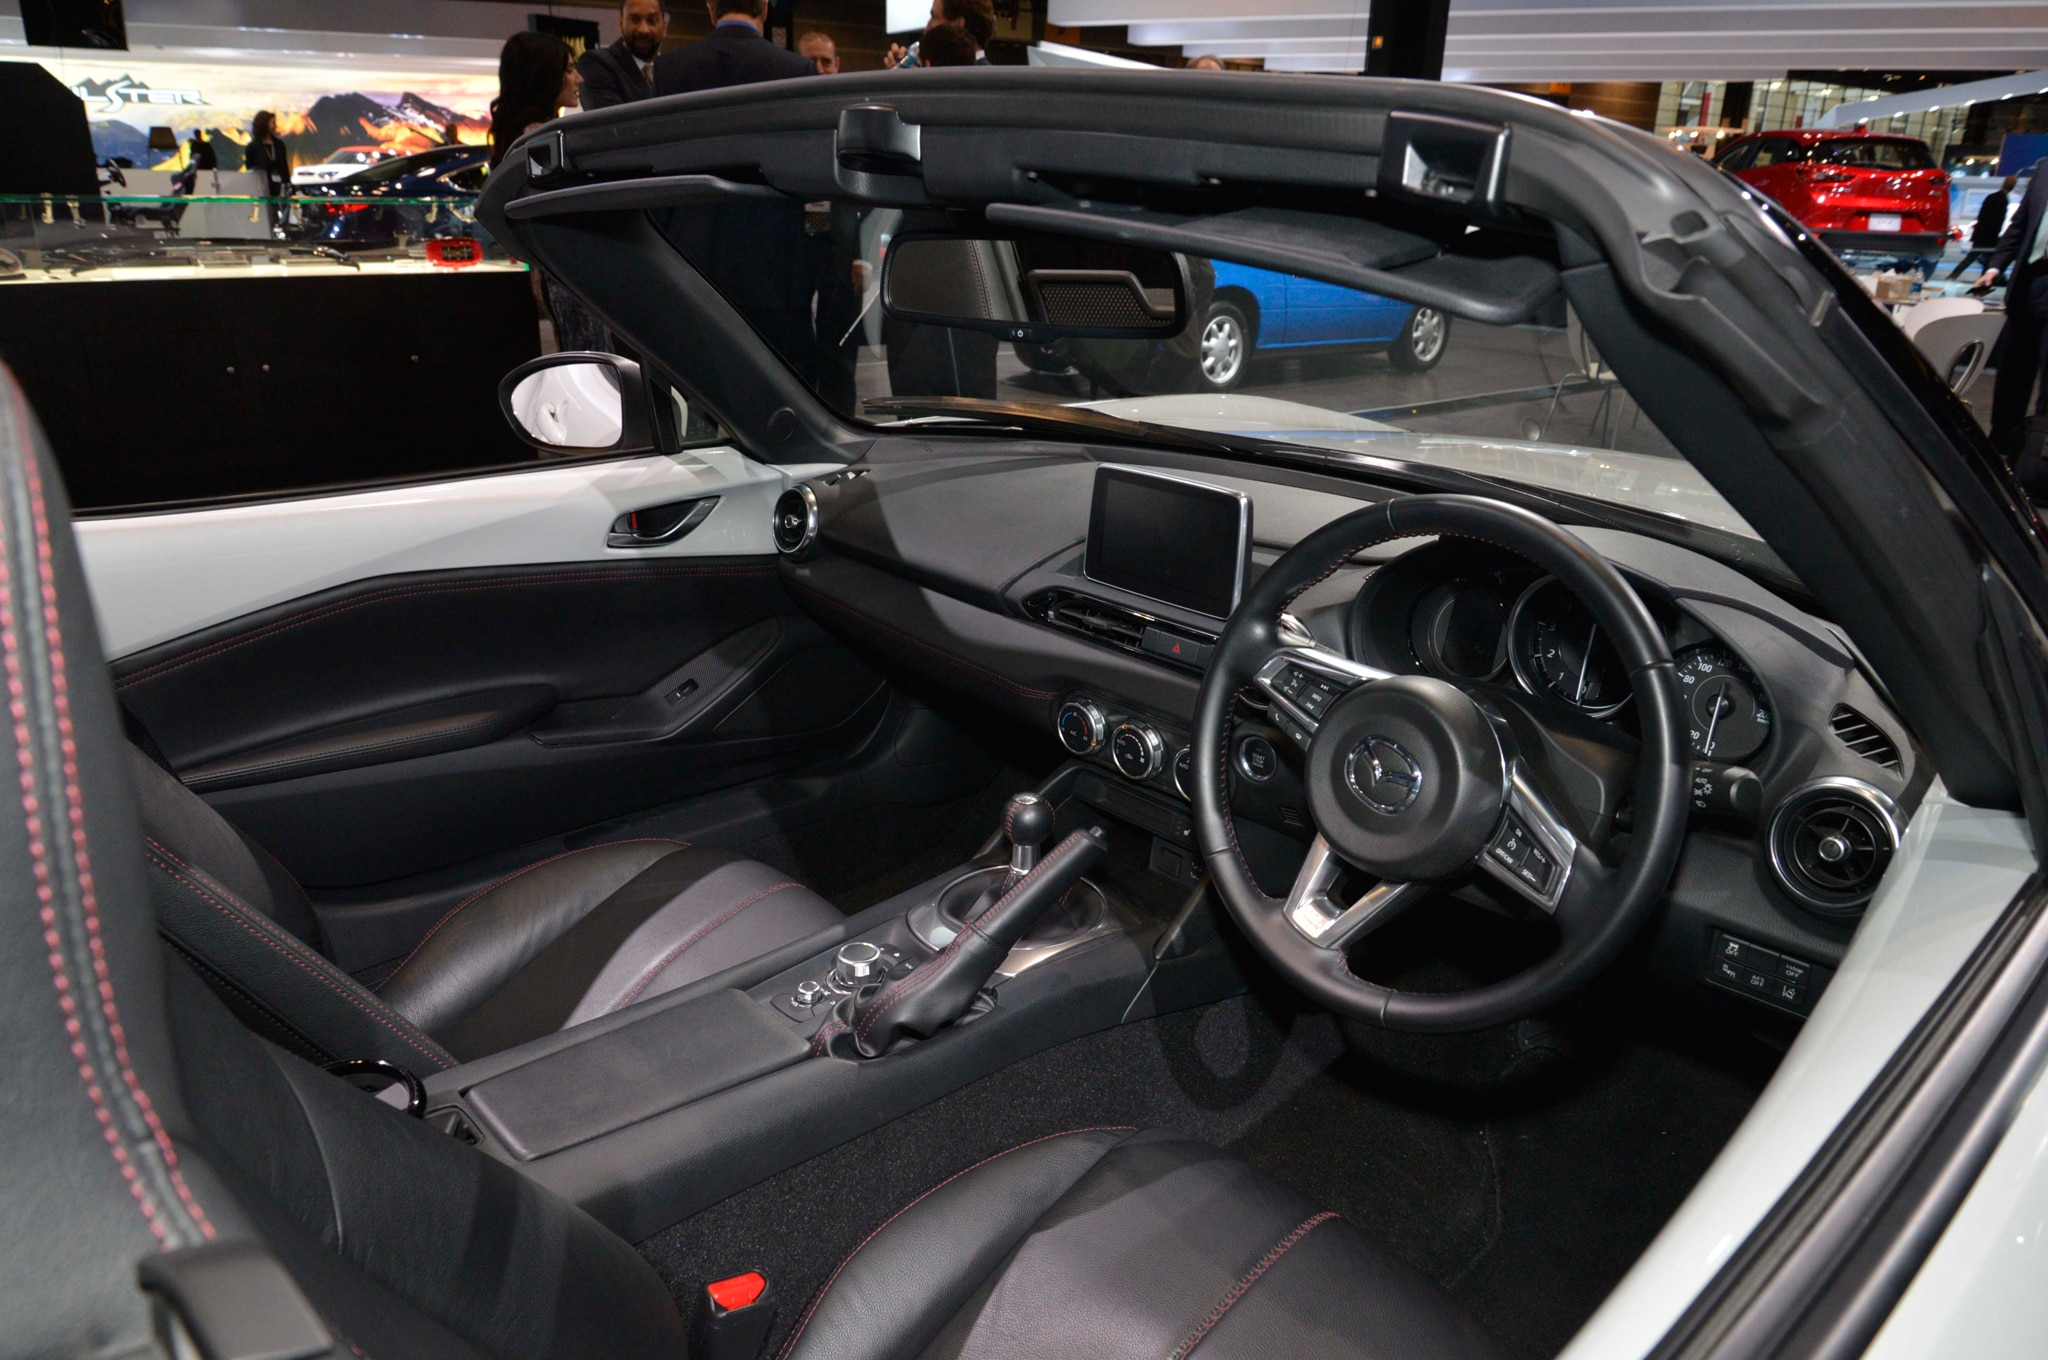 https://st.automobilemag.com/uploads/sites/11/2015/03/2016-Mazda-MX-5-Accessories-concept-cockpit.jpg